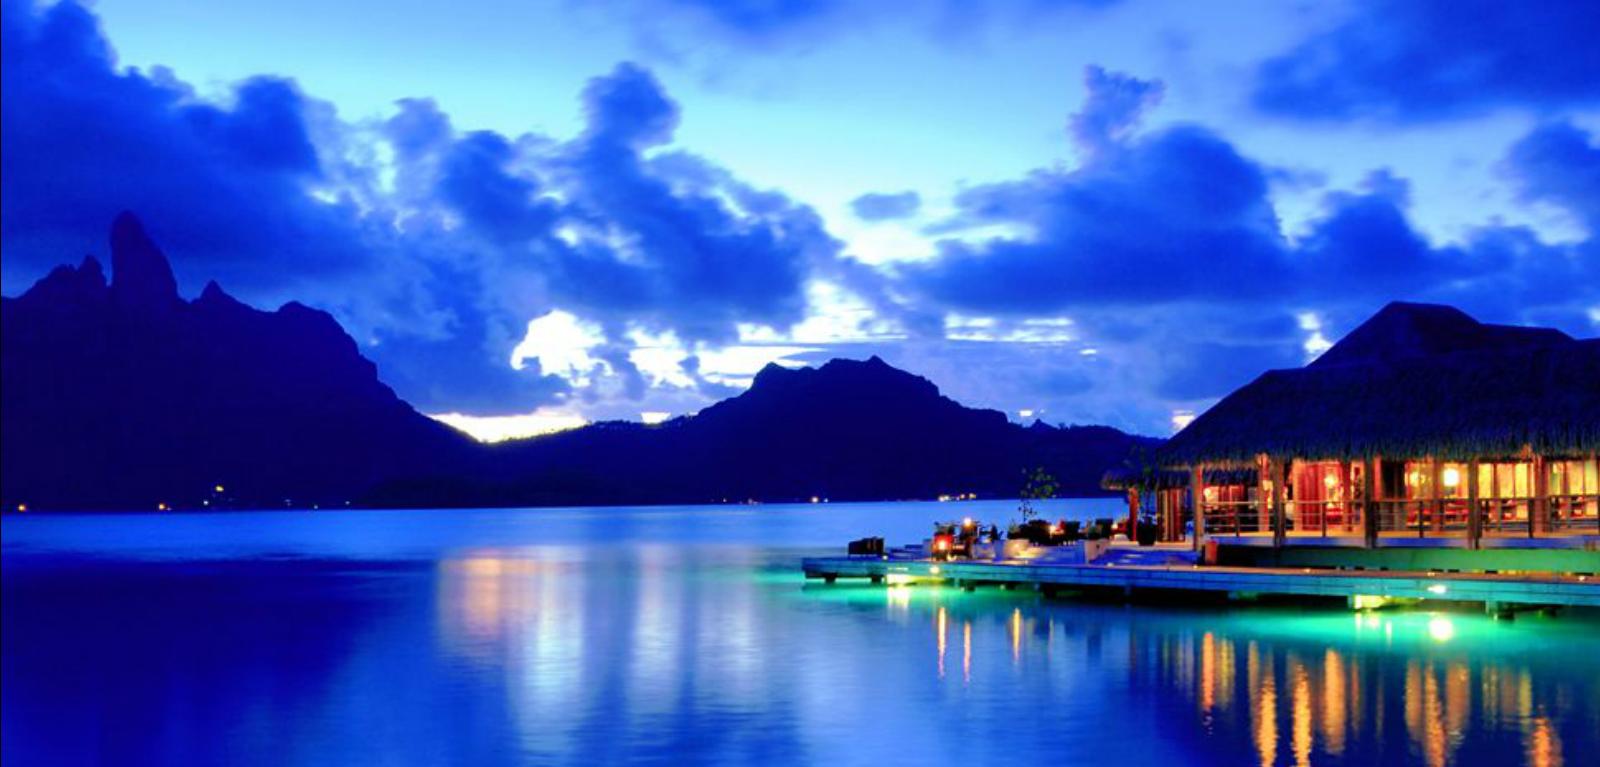 http://www.kiwicollection.com/hotel-detail/st-regis-bora-bora-resort